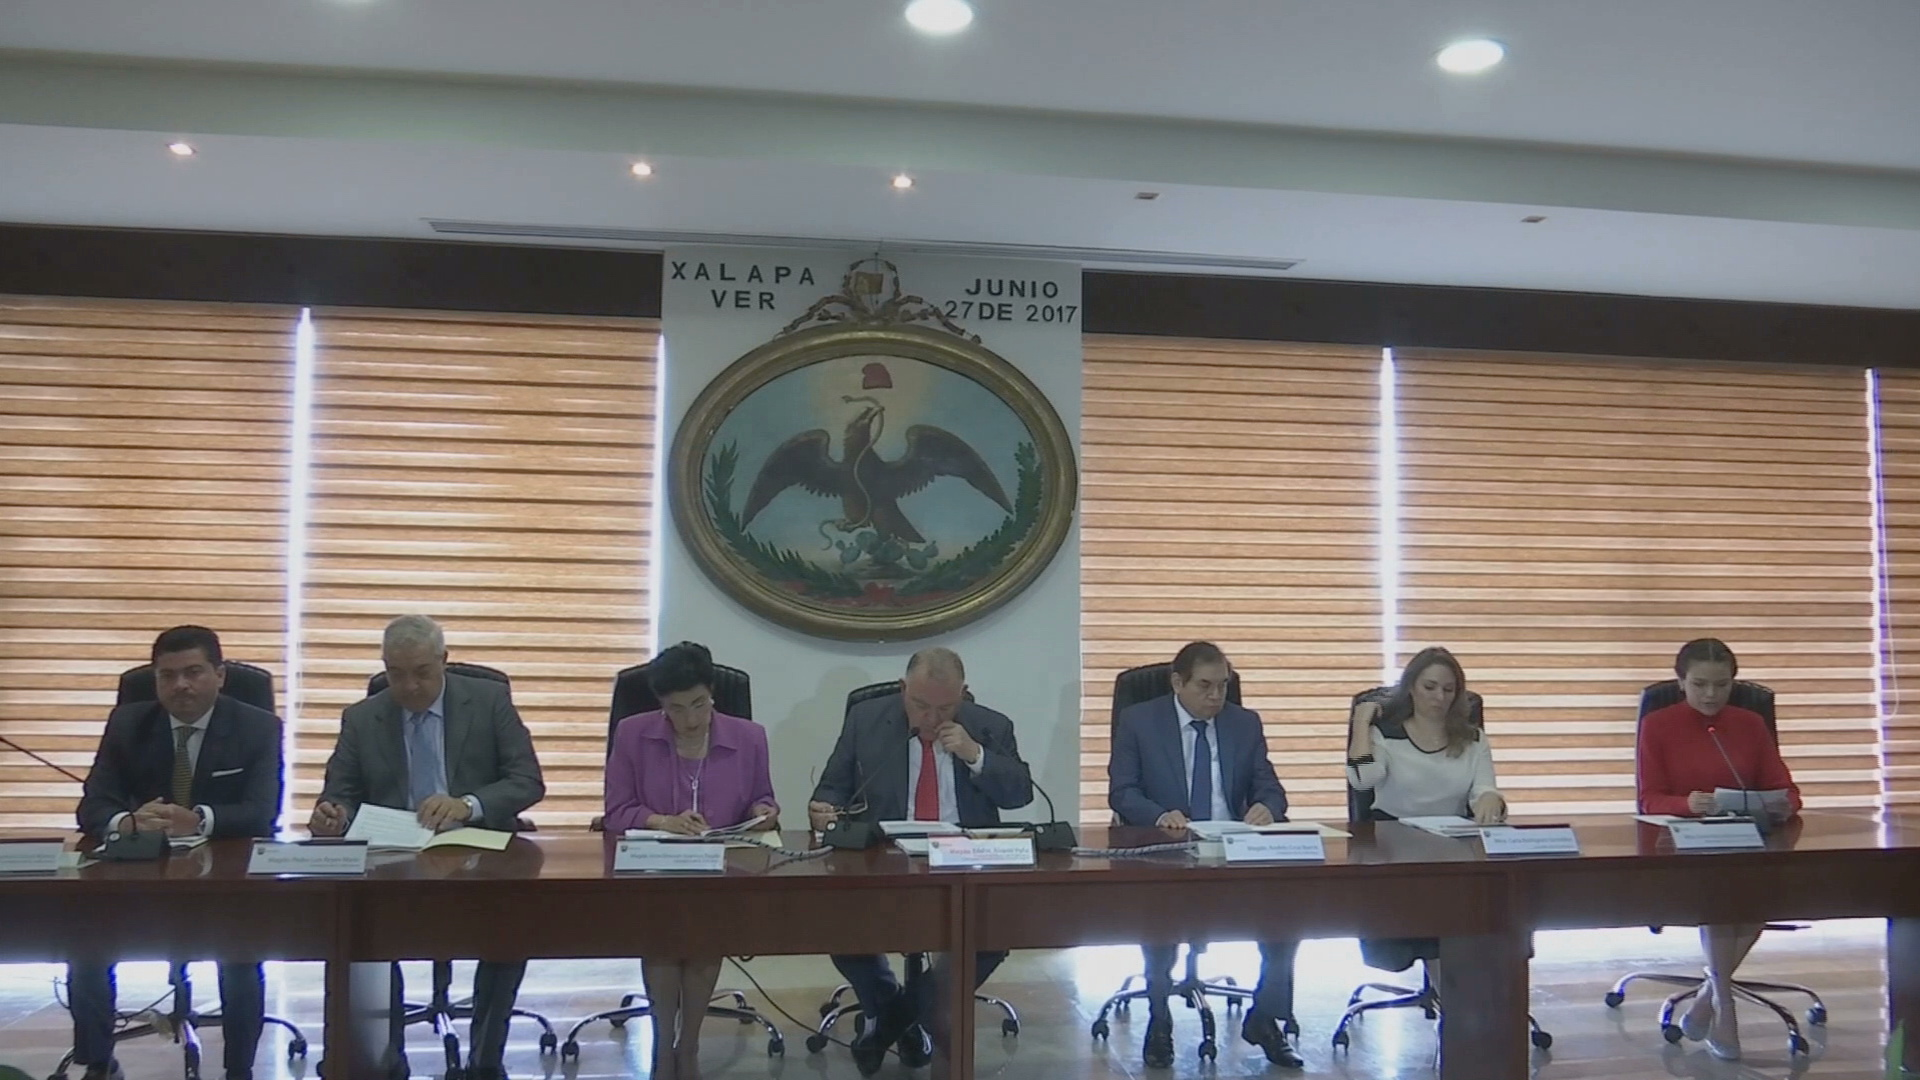 Poder Judicial sigue con rezago para implementar Nuevo Modelo de Justicia Penal en Veracruz